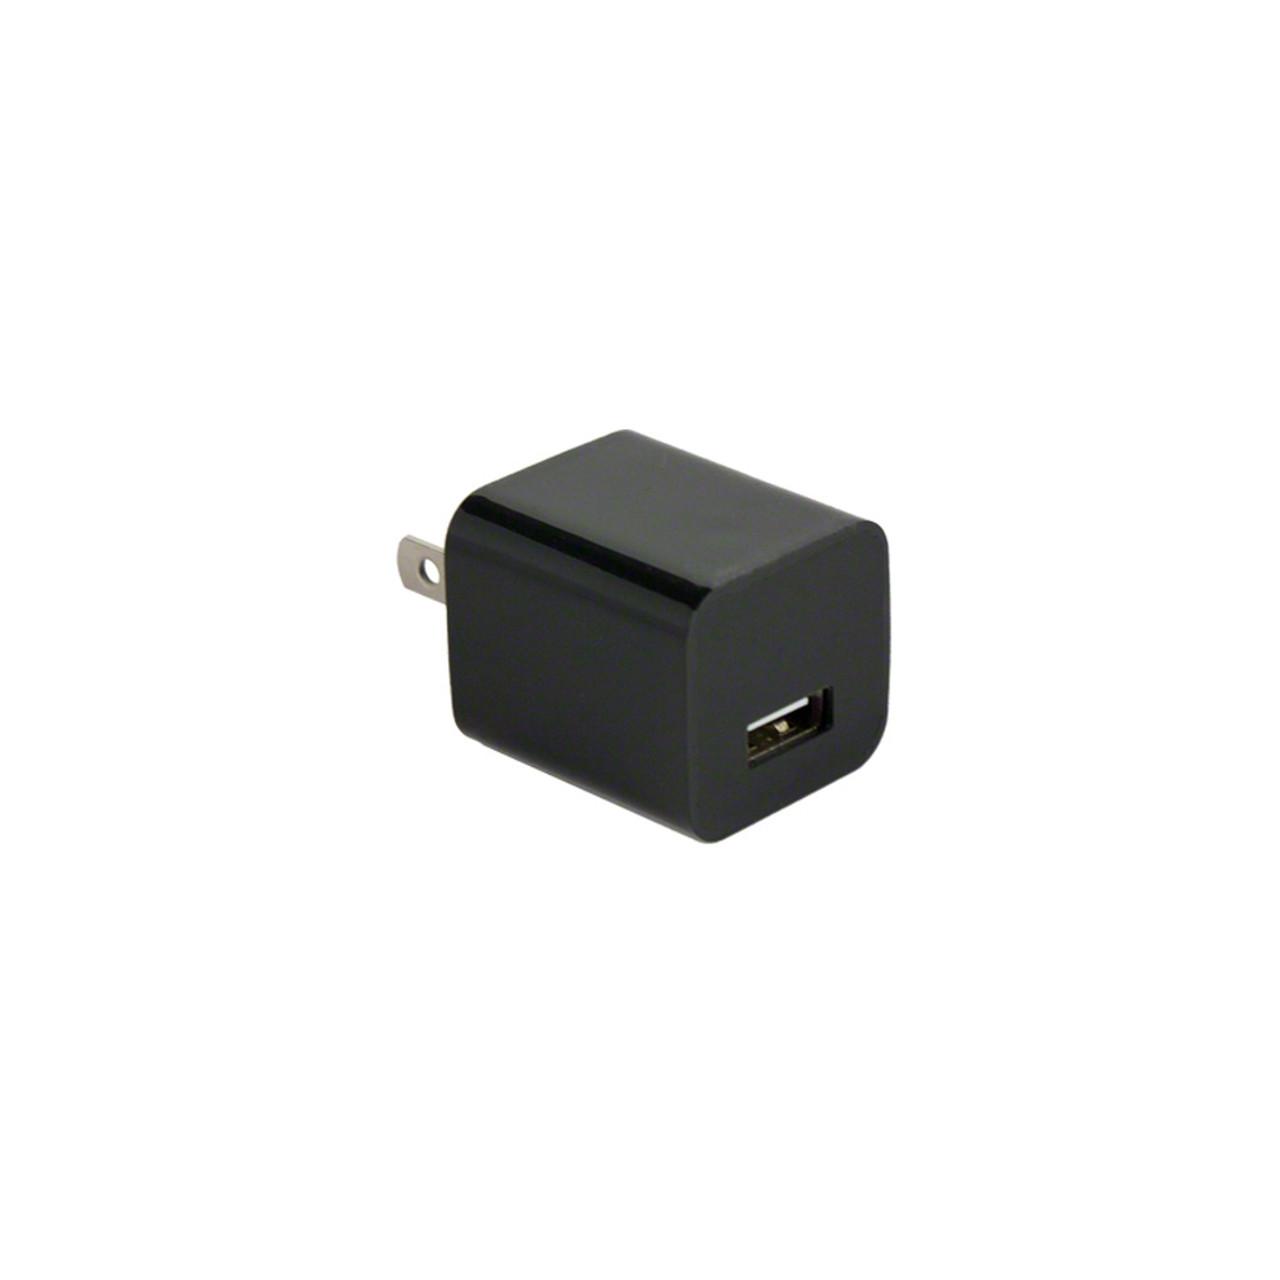 1080P HD Mini USB Wall Charger Hidden Spy Camera